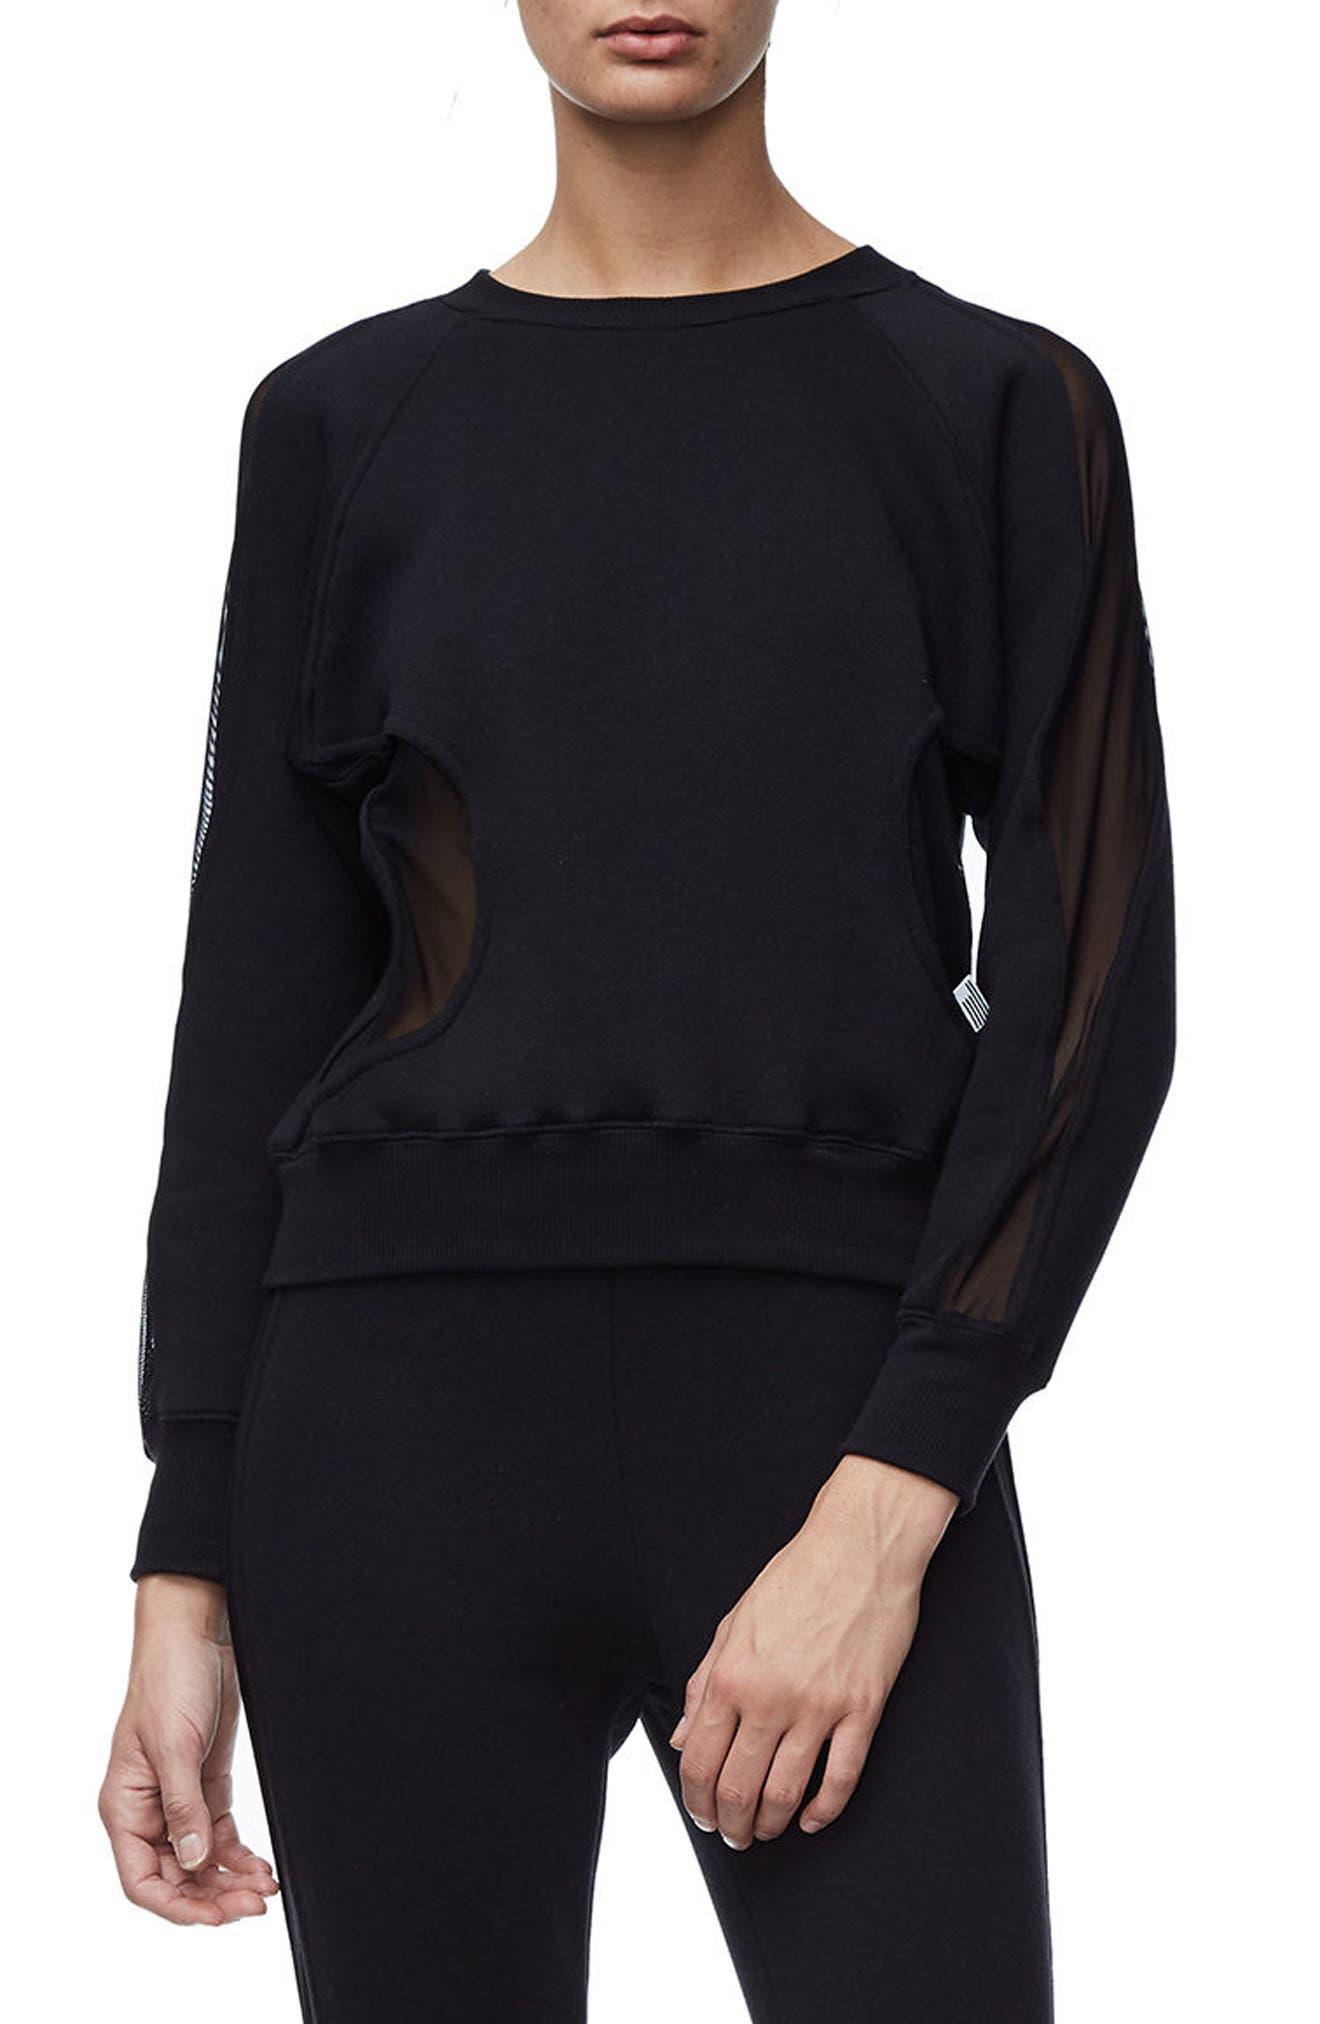 Good Sweats Mesh Inset Sweatshirt,                             Main thumbnail 1, color,                             Good Black